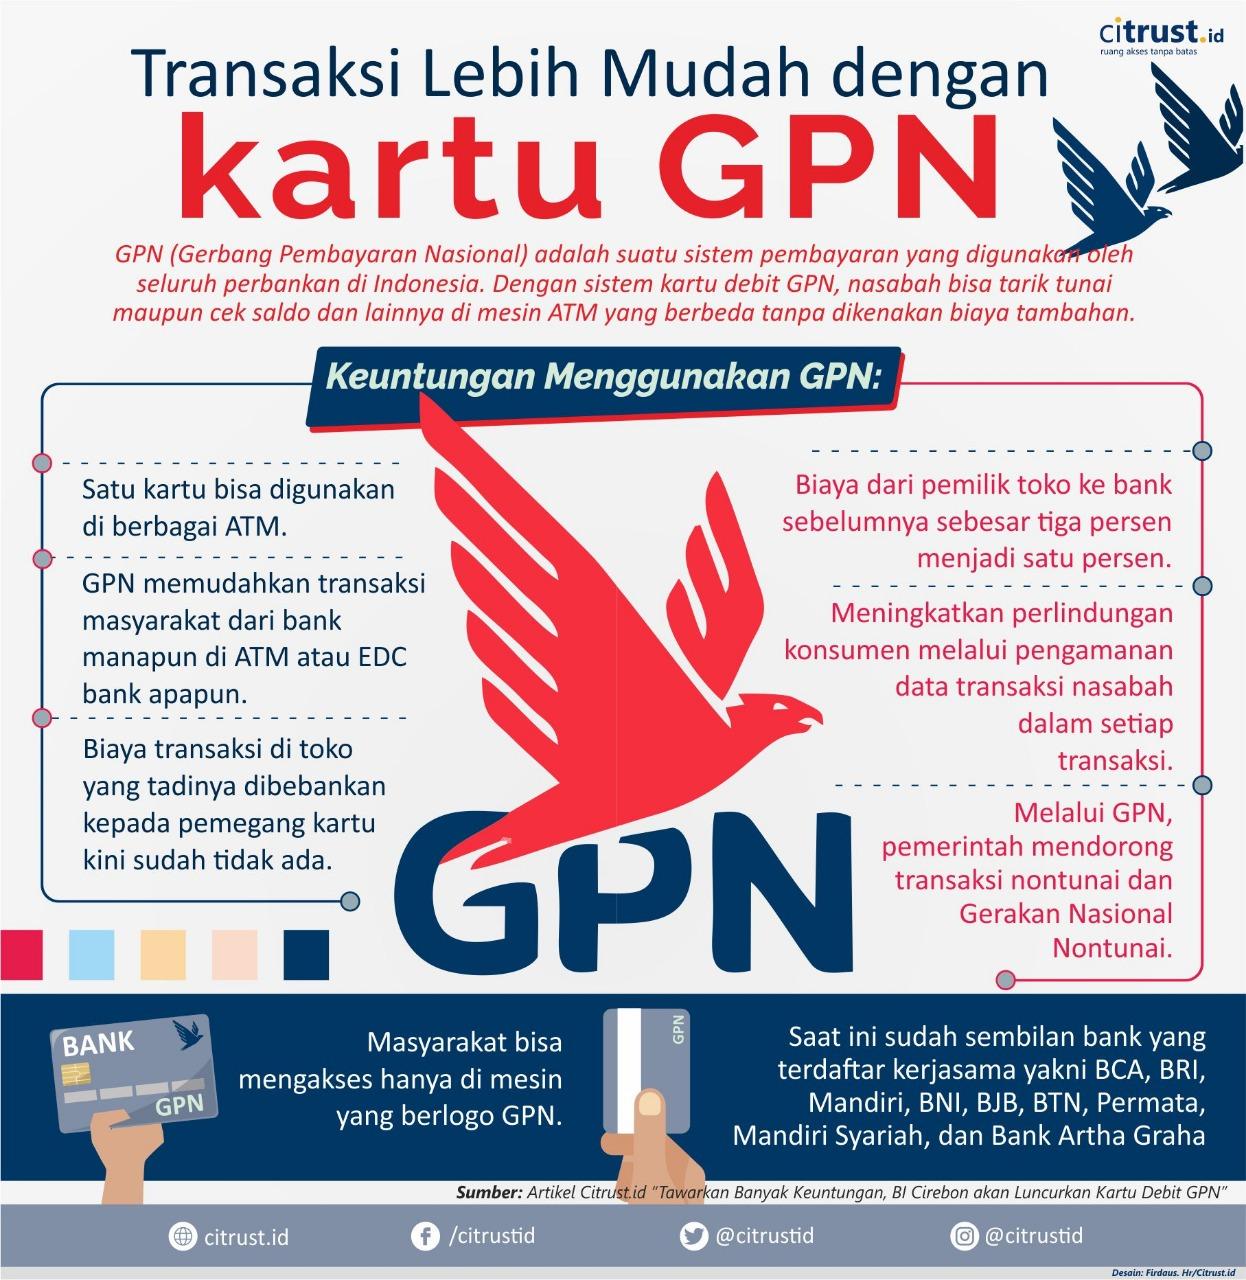 Kartu GPN